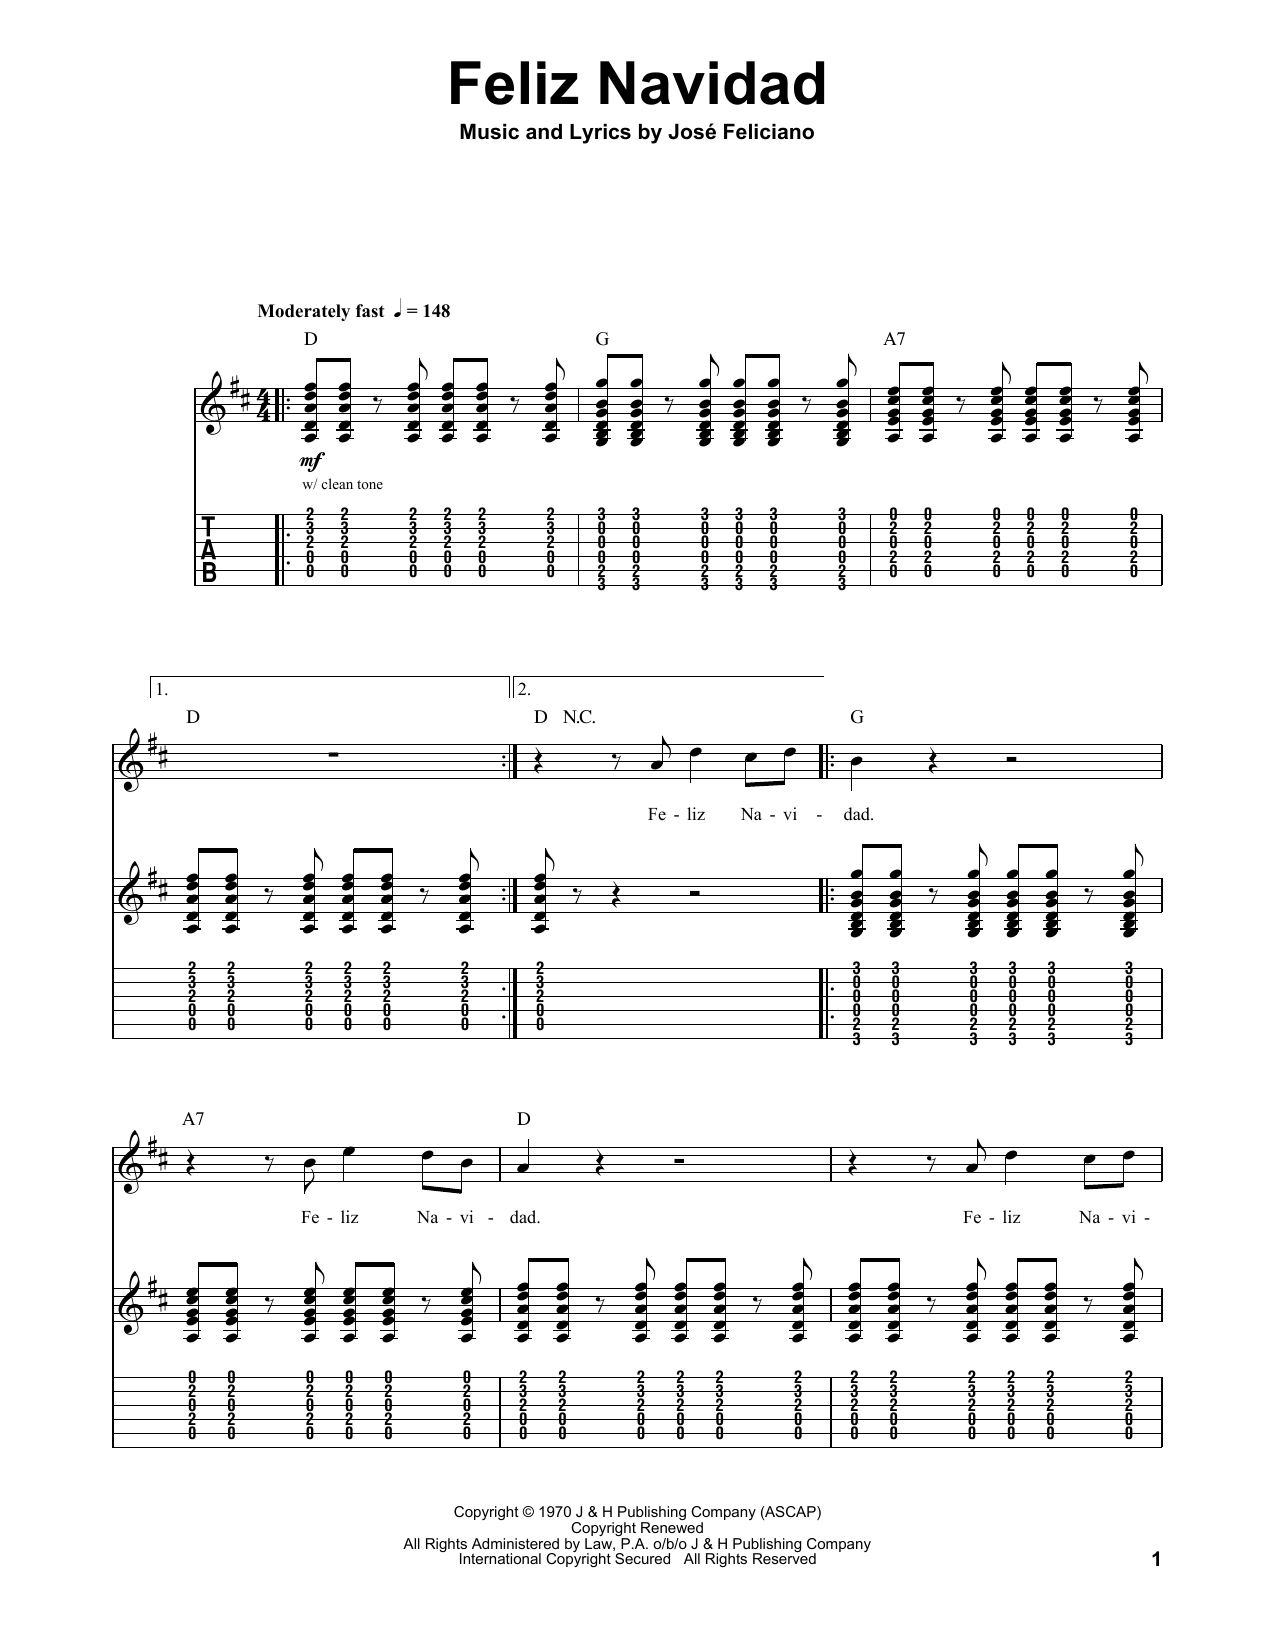 Feliz Navidad Sheet Music By Jose Feliciano Guitar Tab Play Along